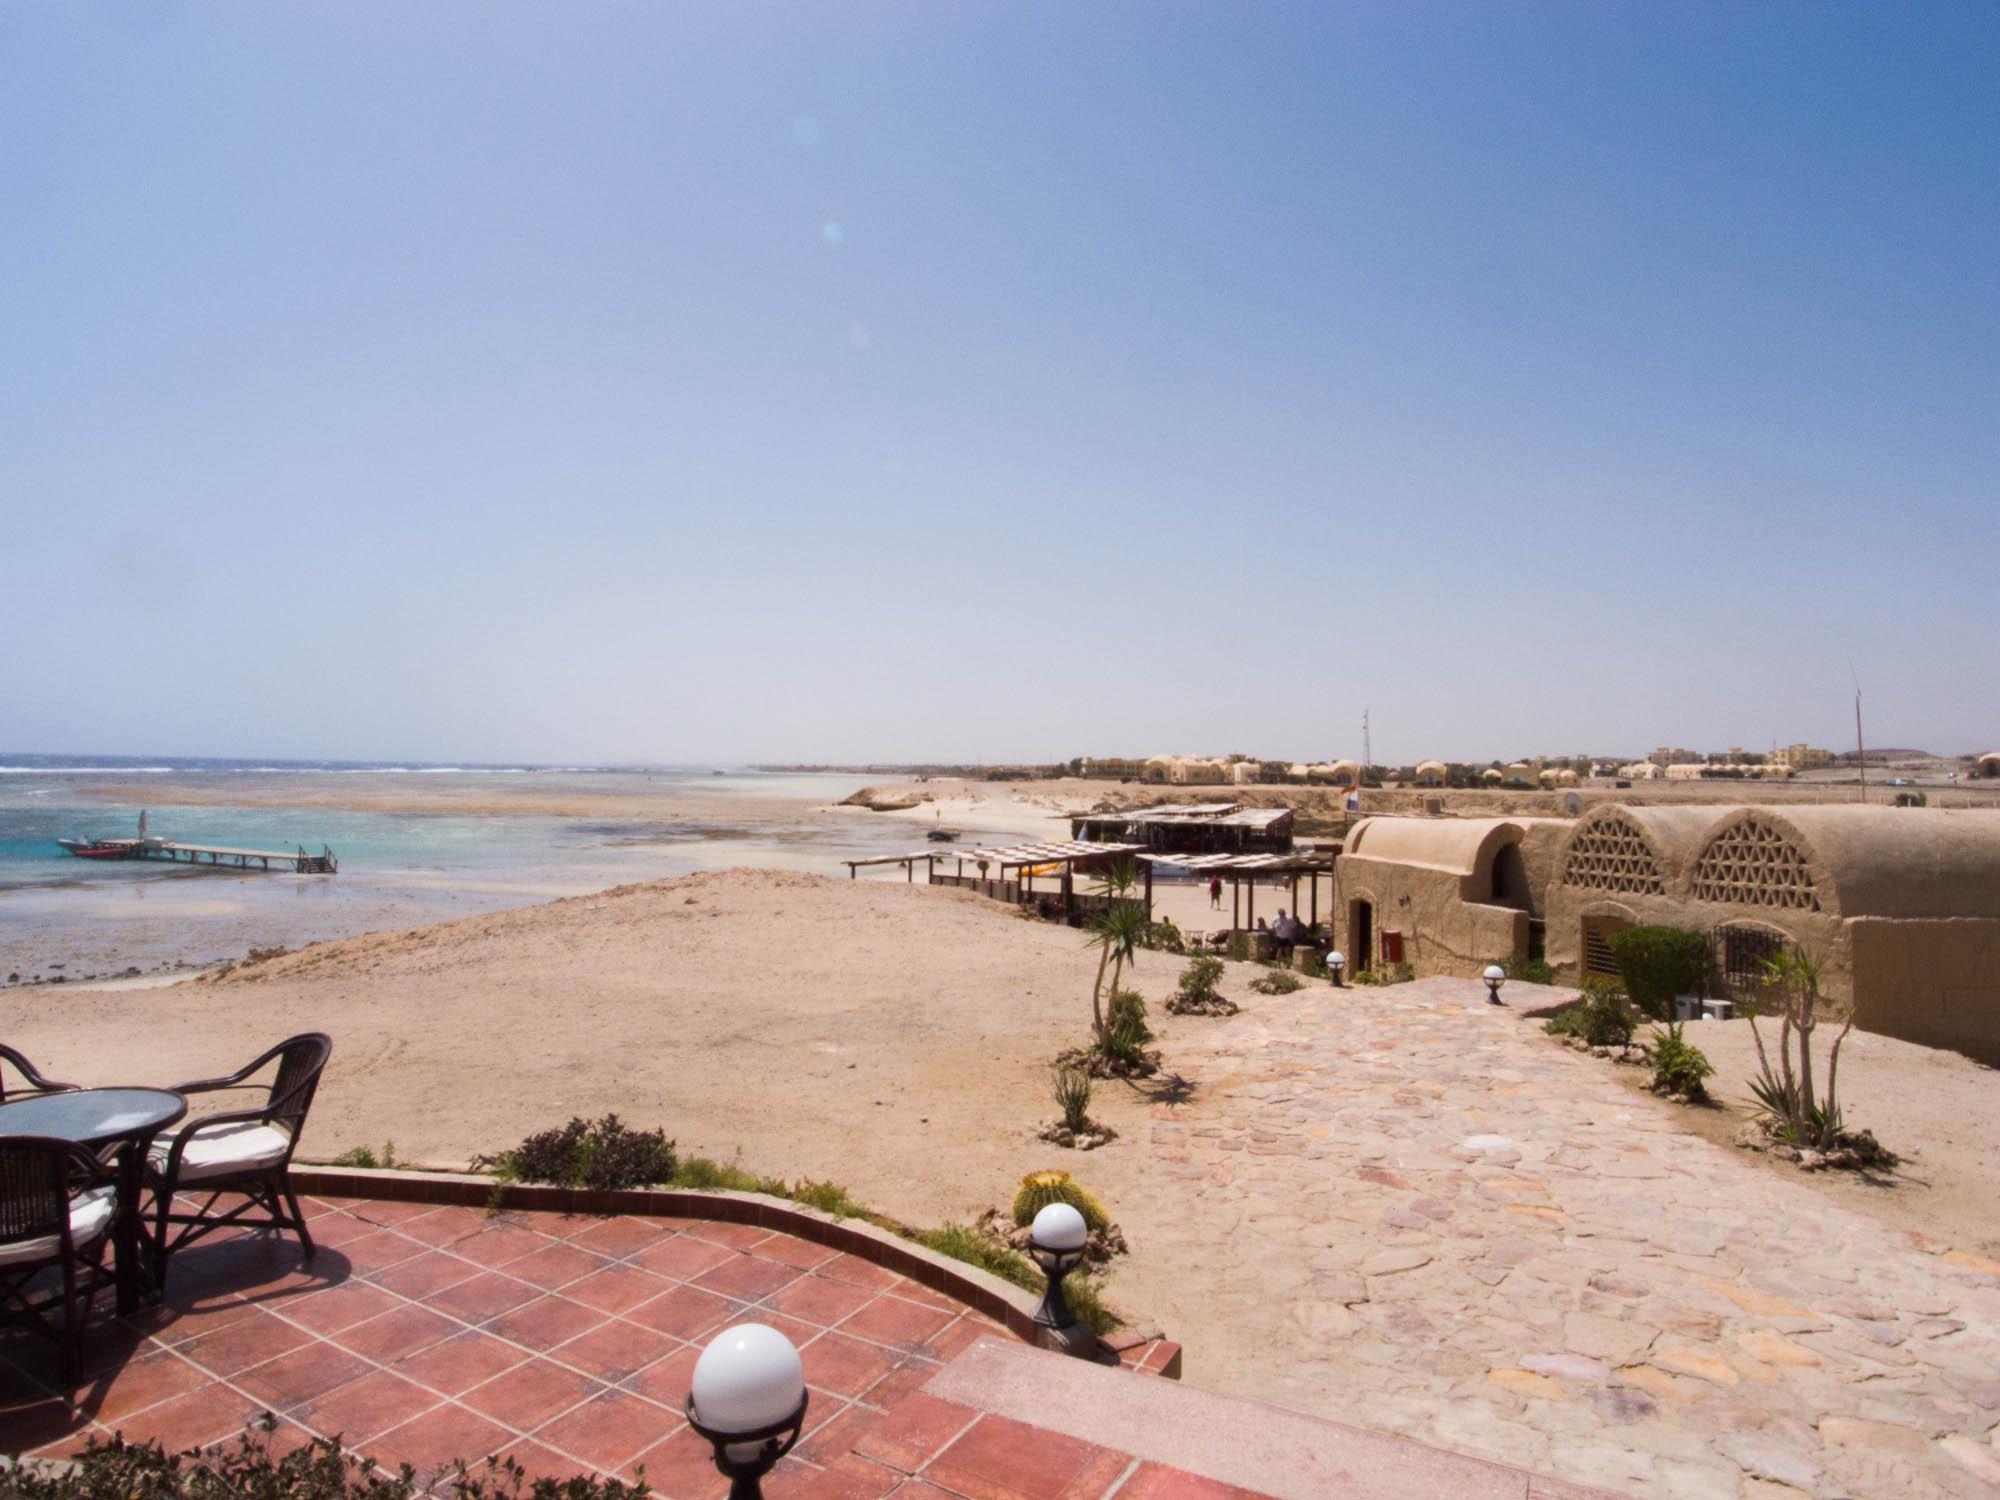 Marsa_Shagra_Red Sea Diving Safari_Tauchen_Rotes_Meer_Ägypten-16